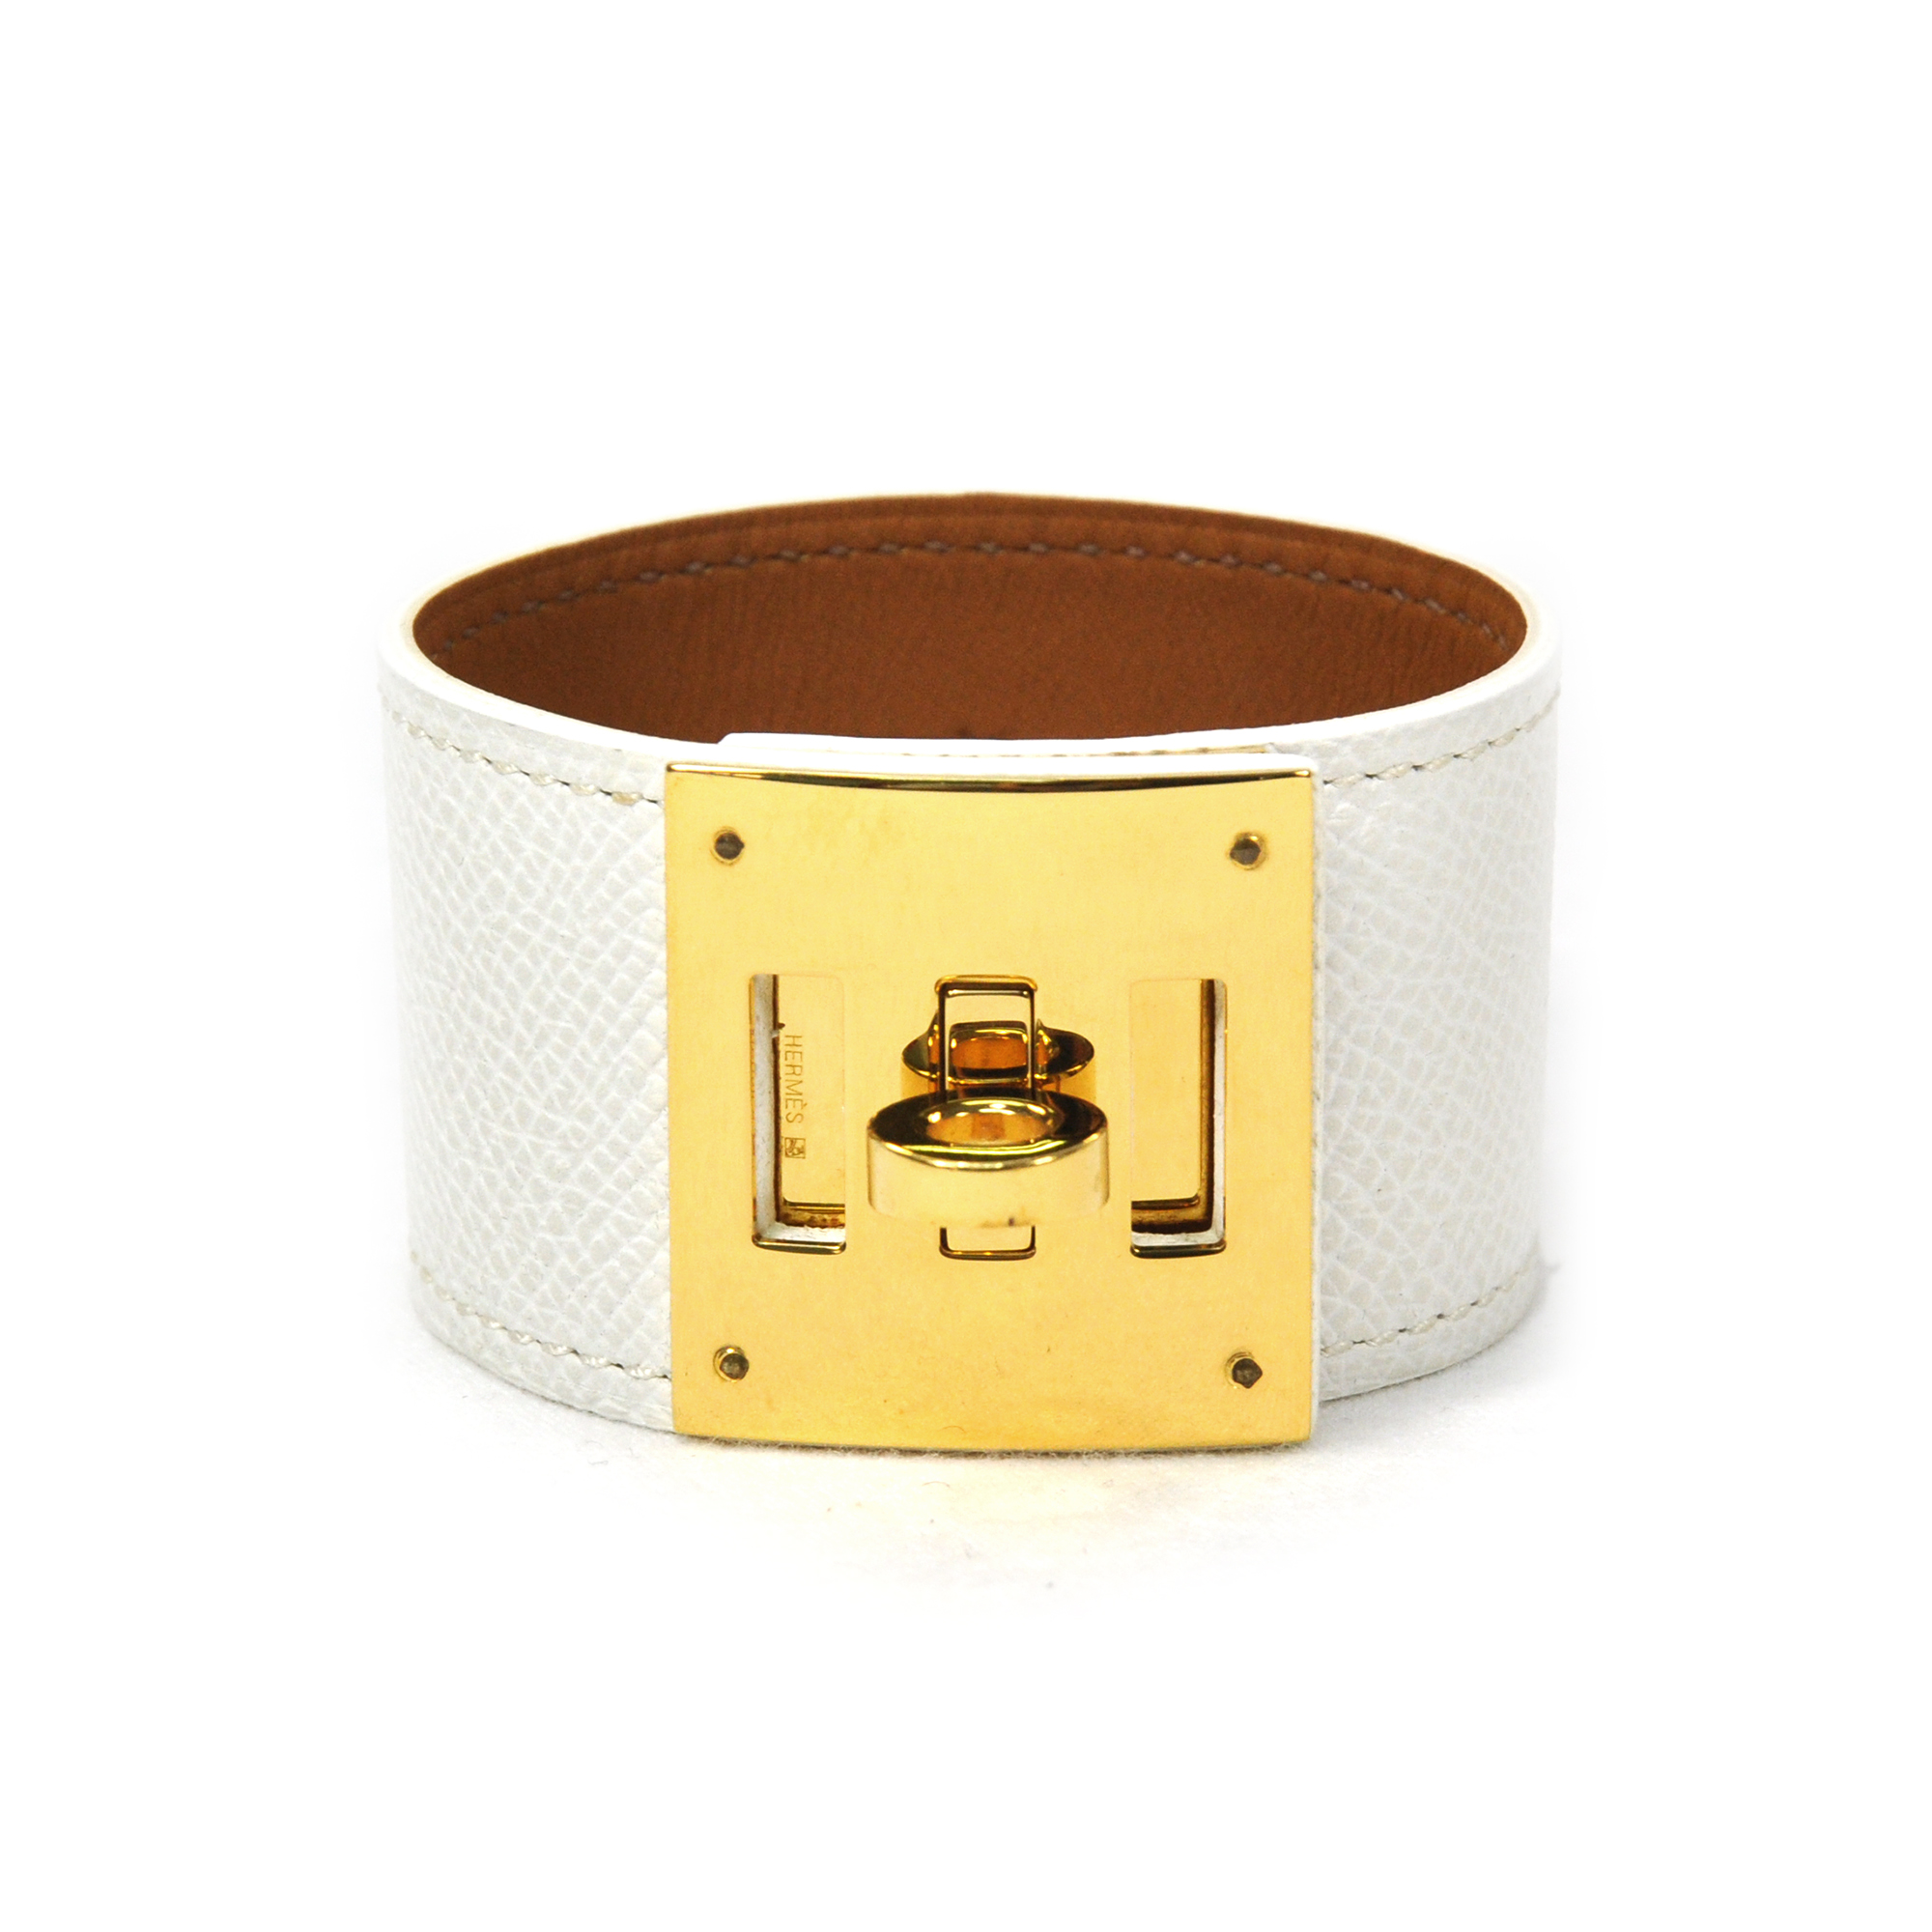 5f1c6176652e Authentic Second Hand Hermès Kelly Dog Bracelet (PSS-304-00007 ...